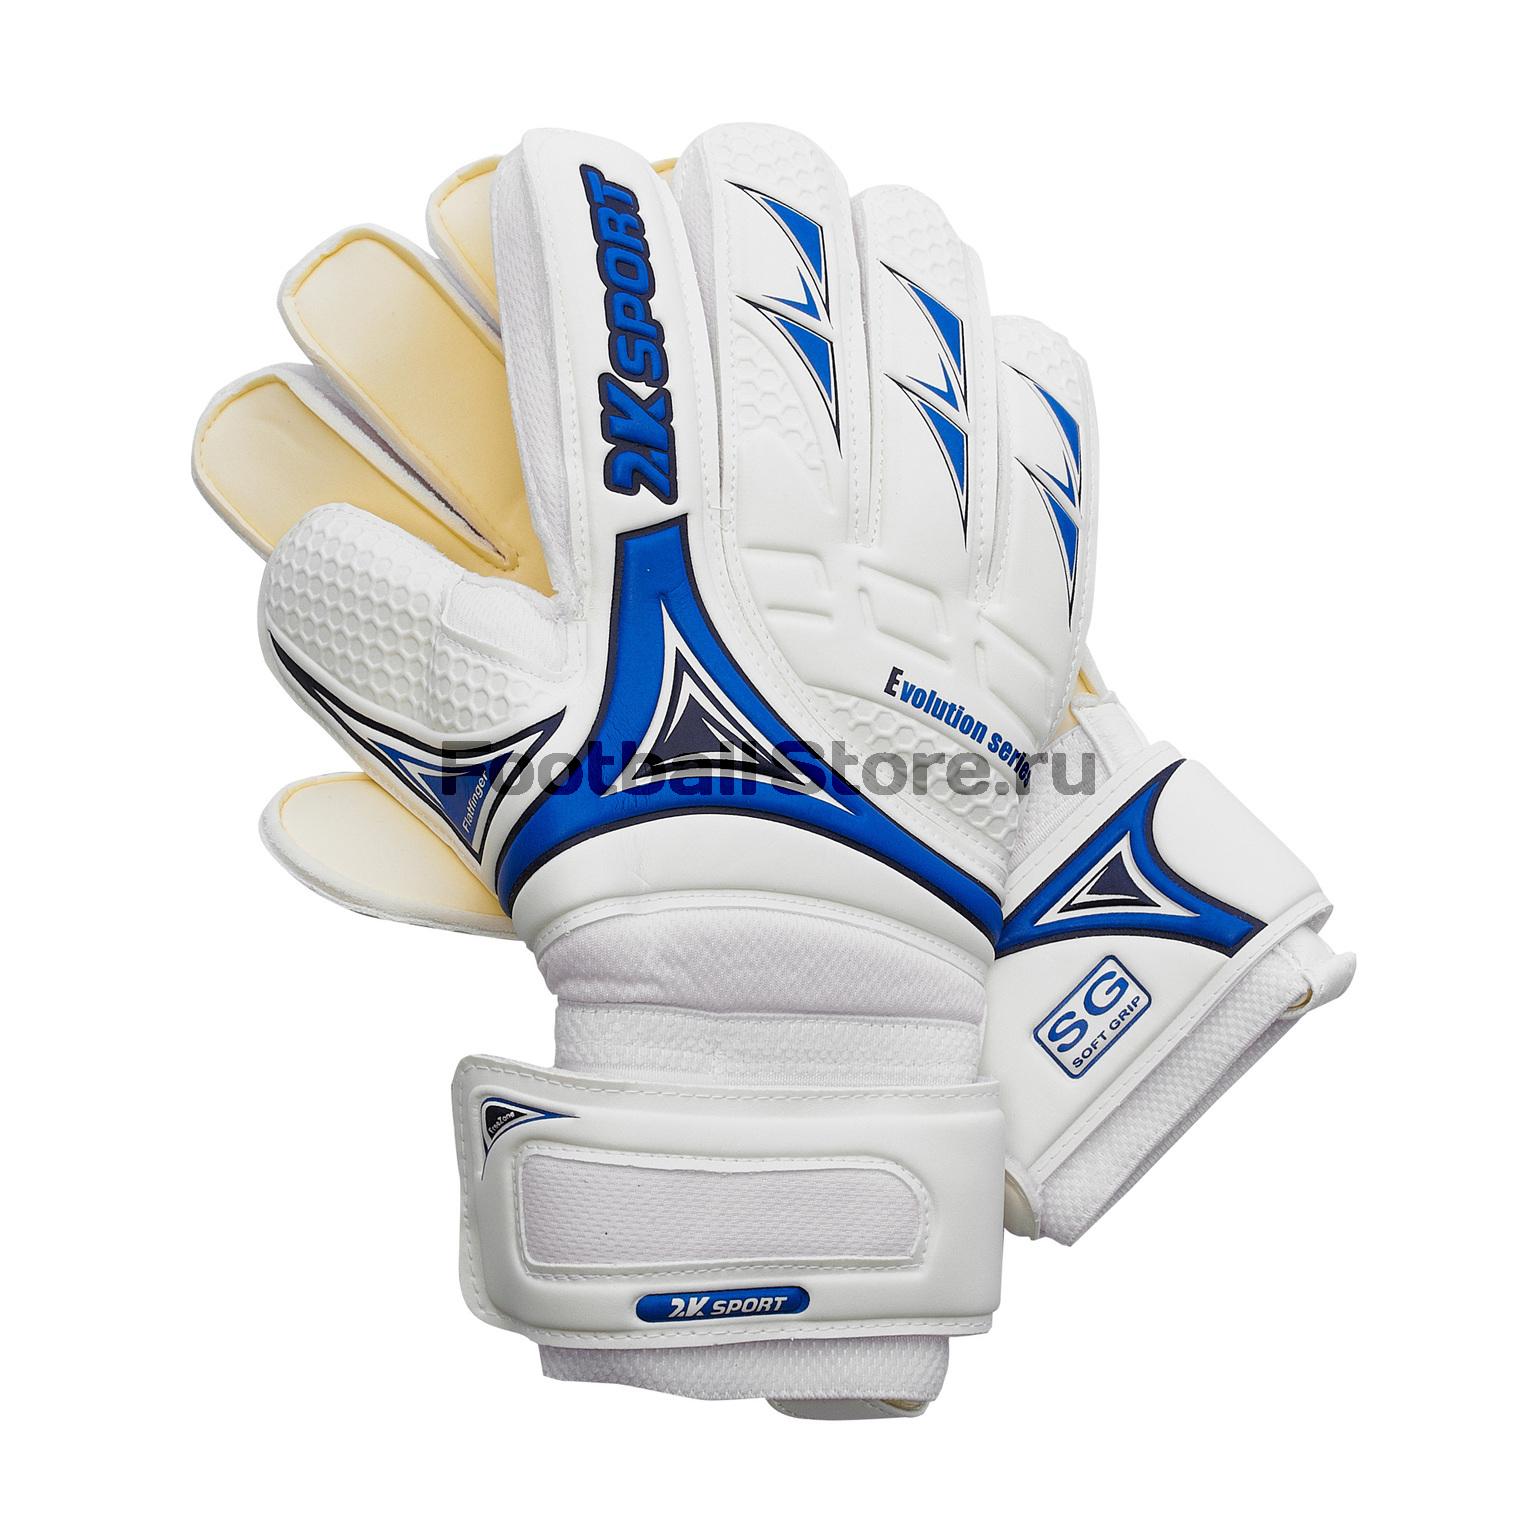 Перчатки вратарские 2K Sport Evolution 124915-WH 500pcs 1210 1 2k 1k2 1 2k ohm 5